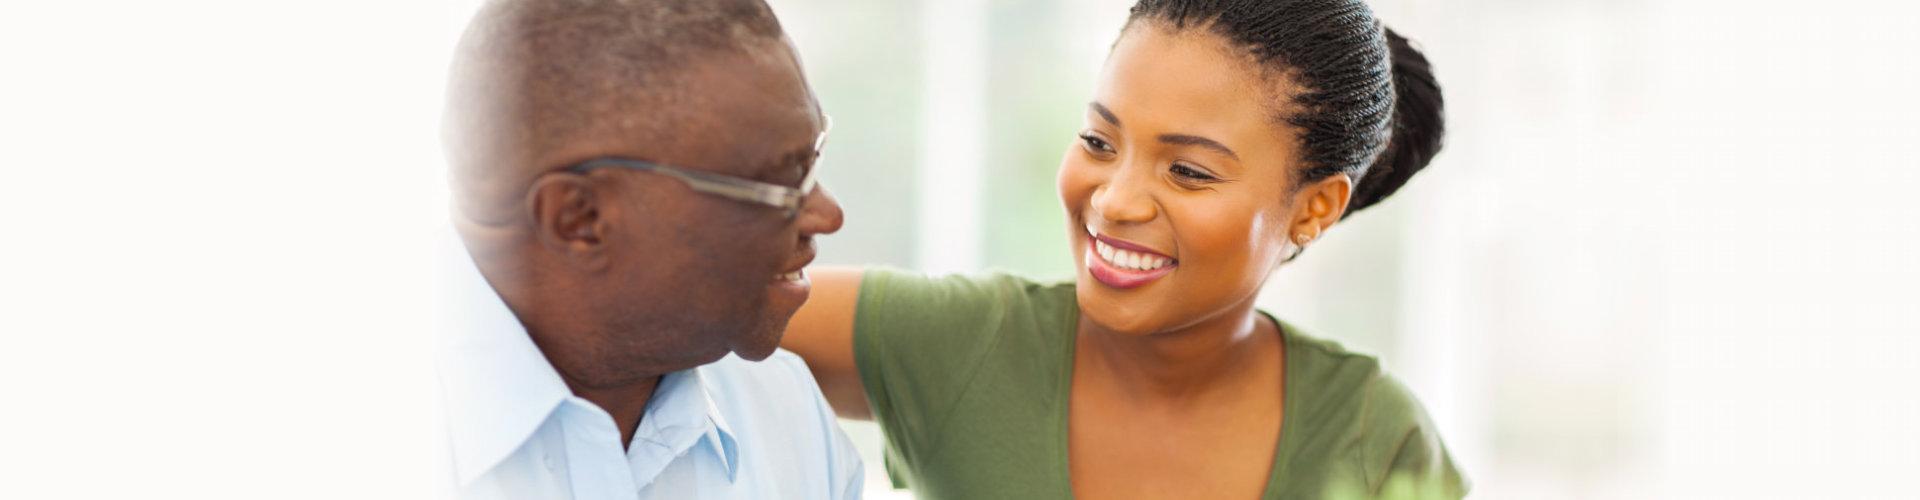 caregiver comforting the elder man